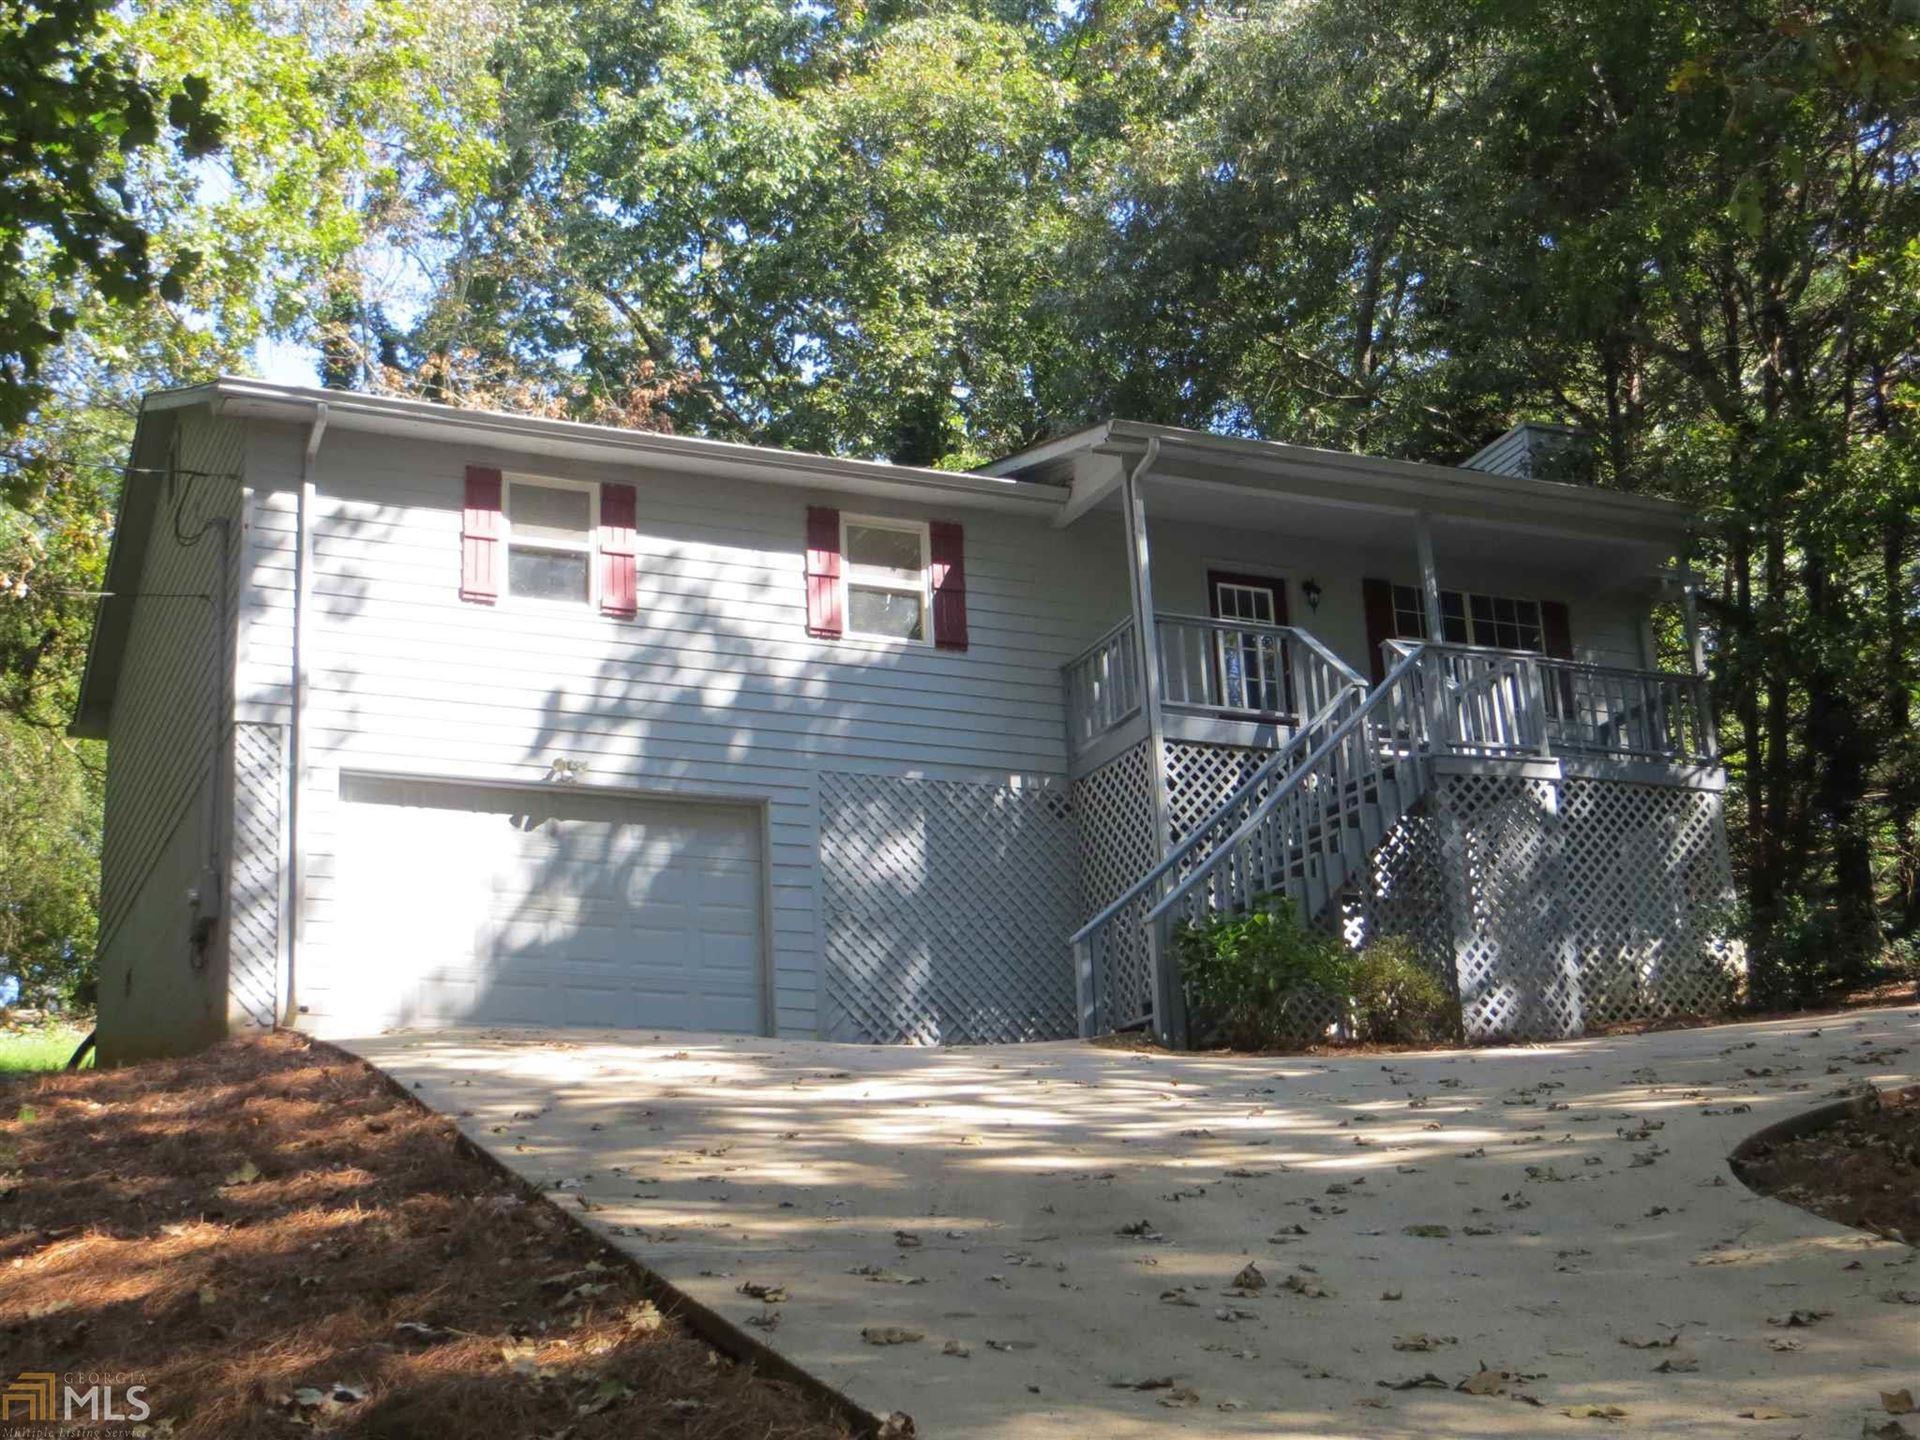 3672 Rosedale Cir, Gainesville, GA 30506 - #: 8868707